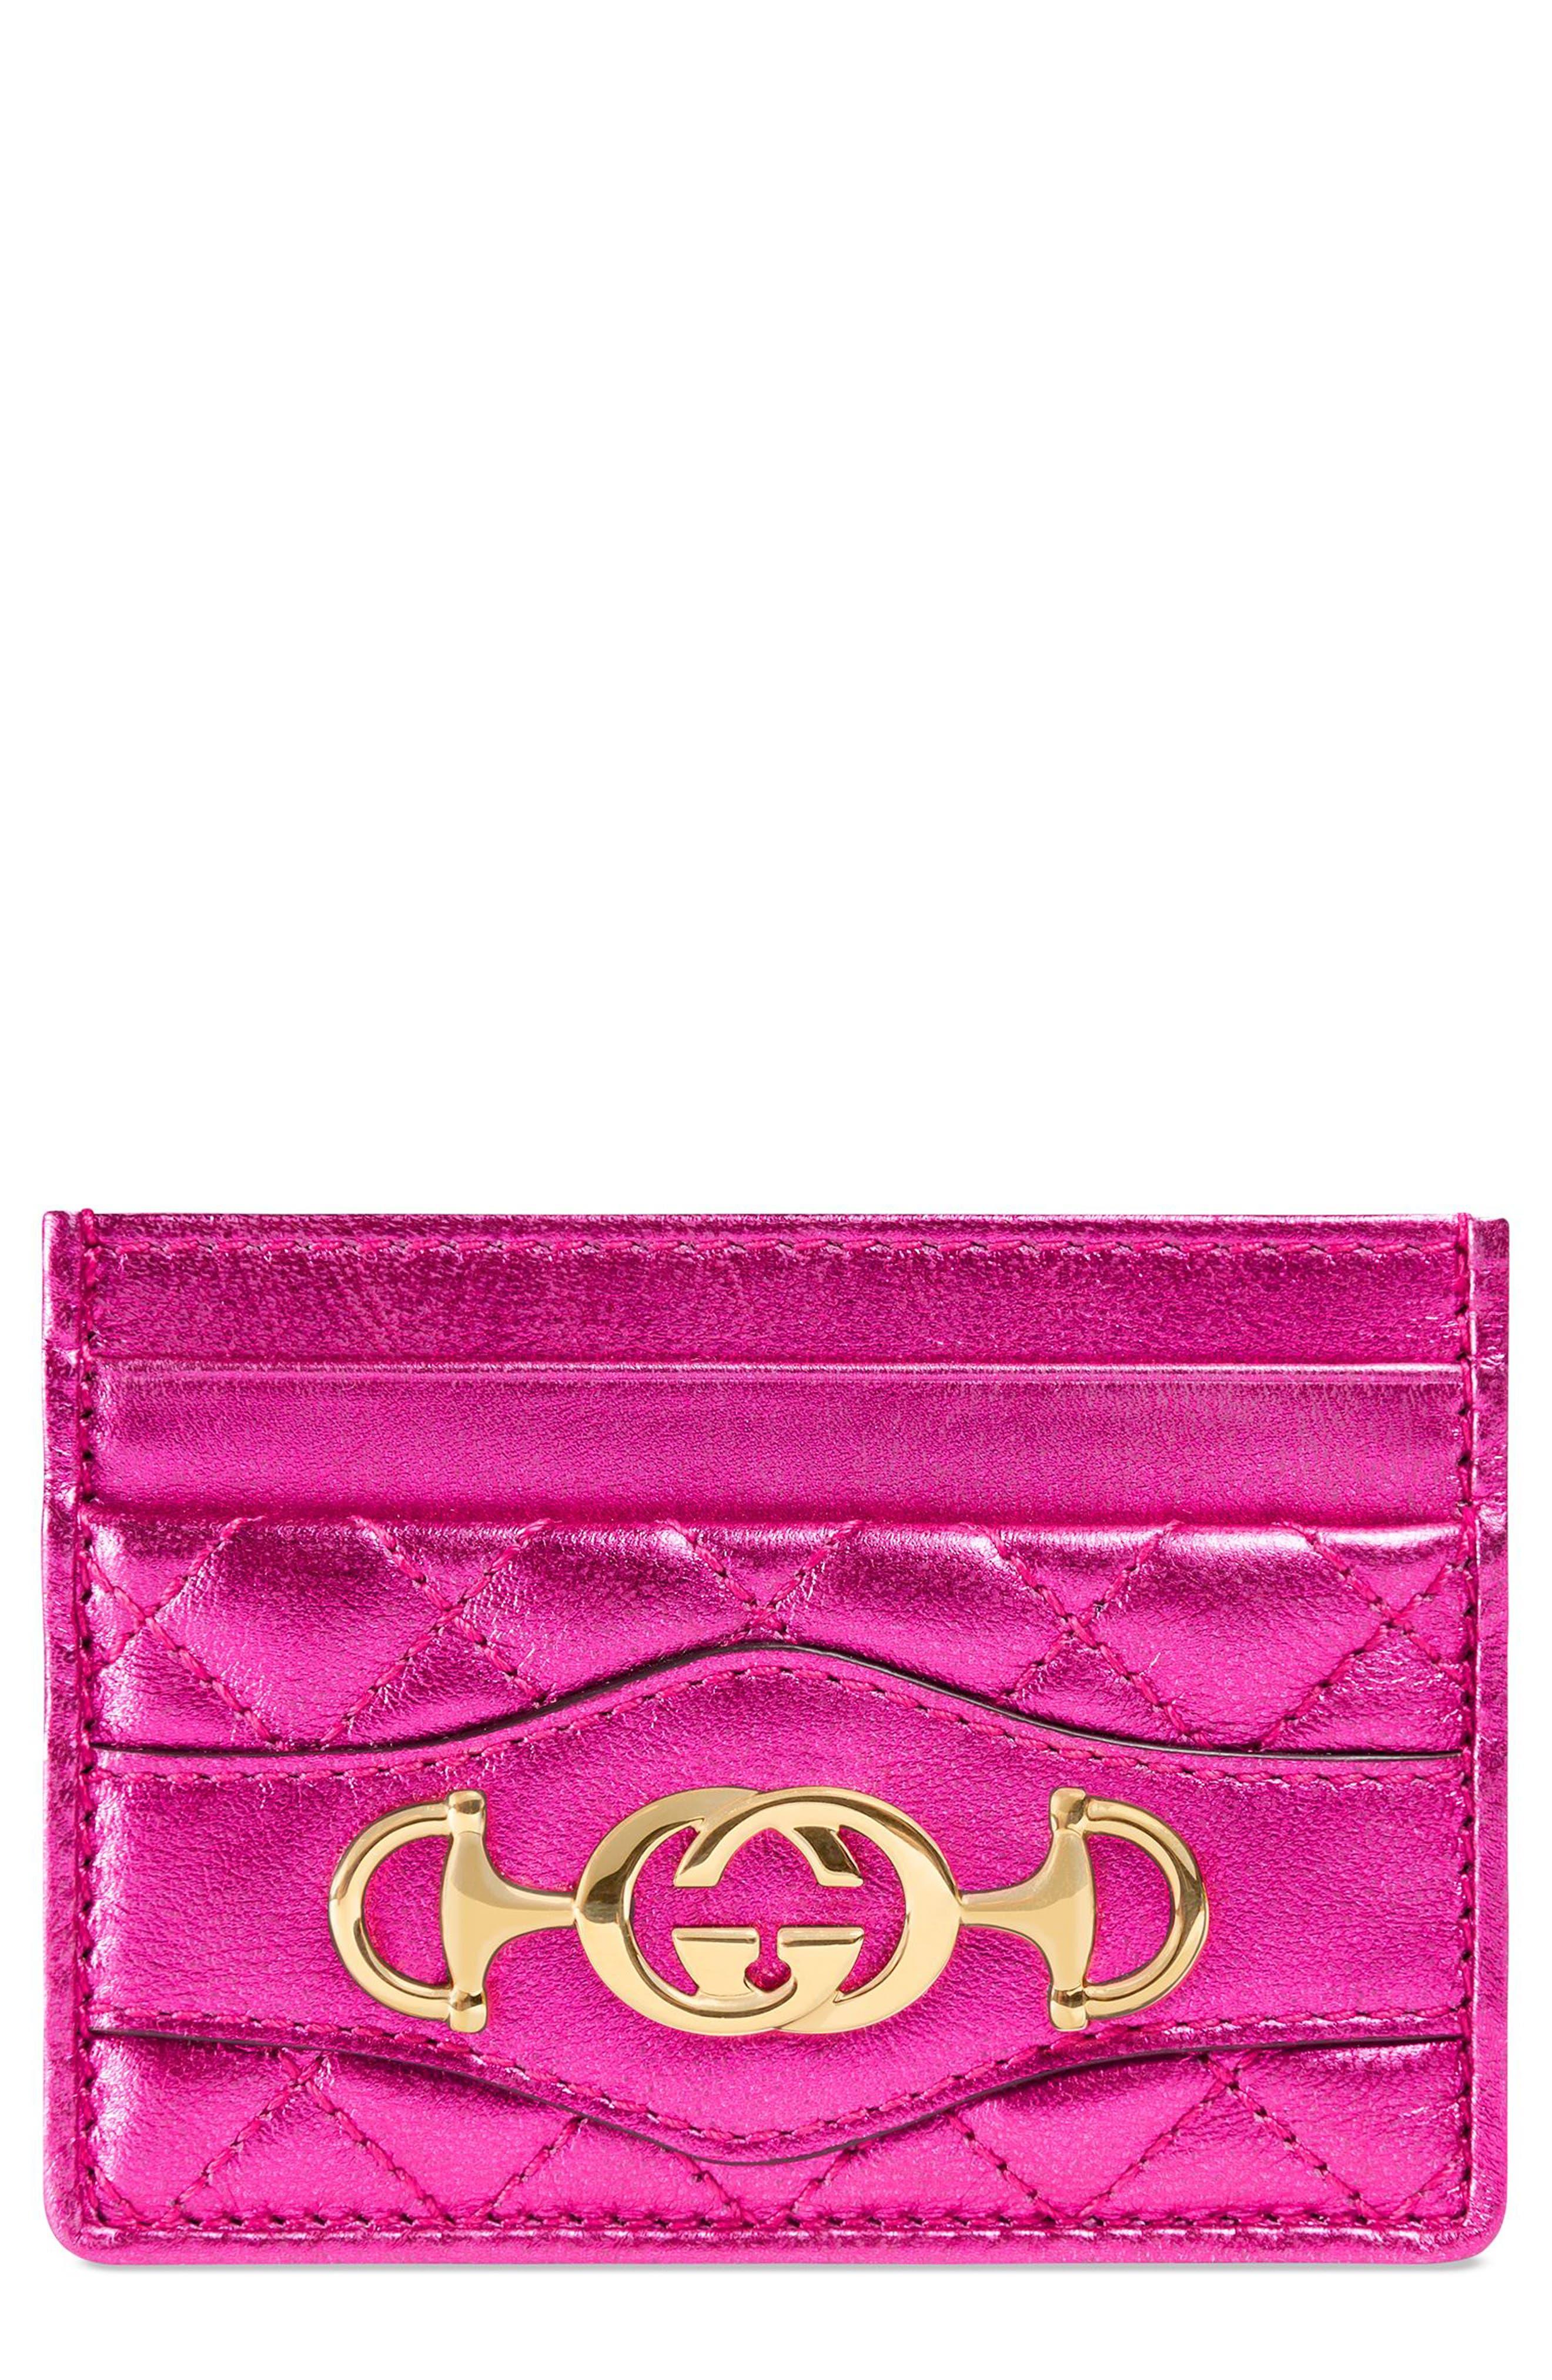 Laminated Leather Card Case,                             Main thumbnail 1, color,                             650